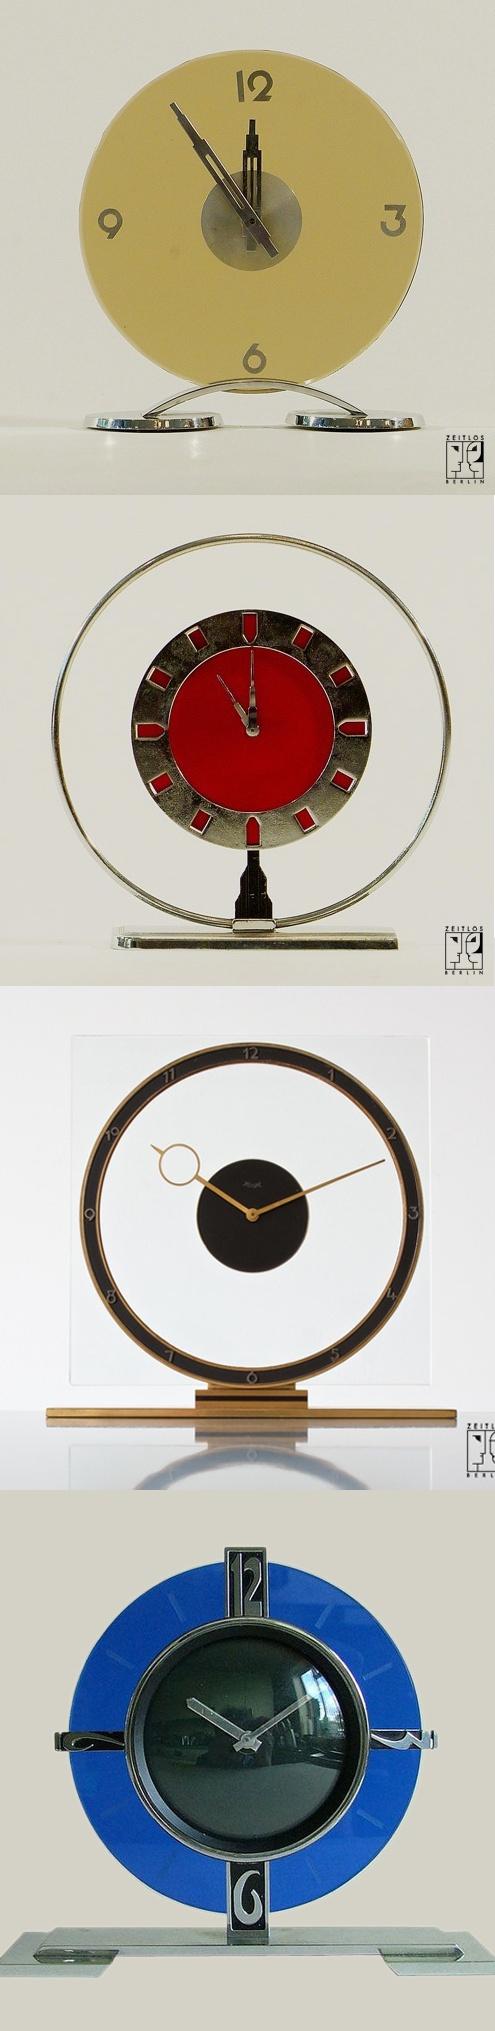 Art Deco clocks, 1930s